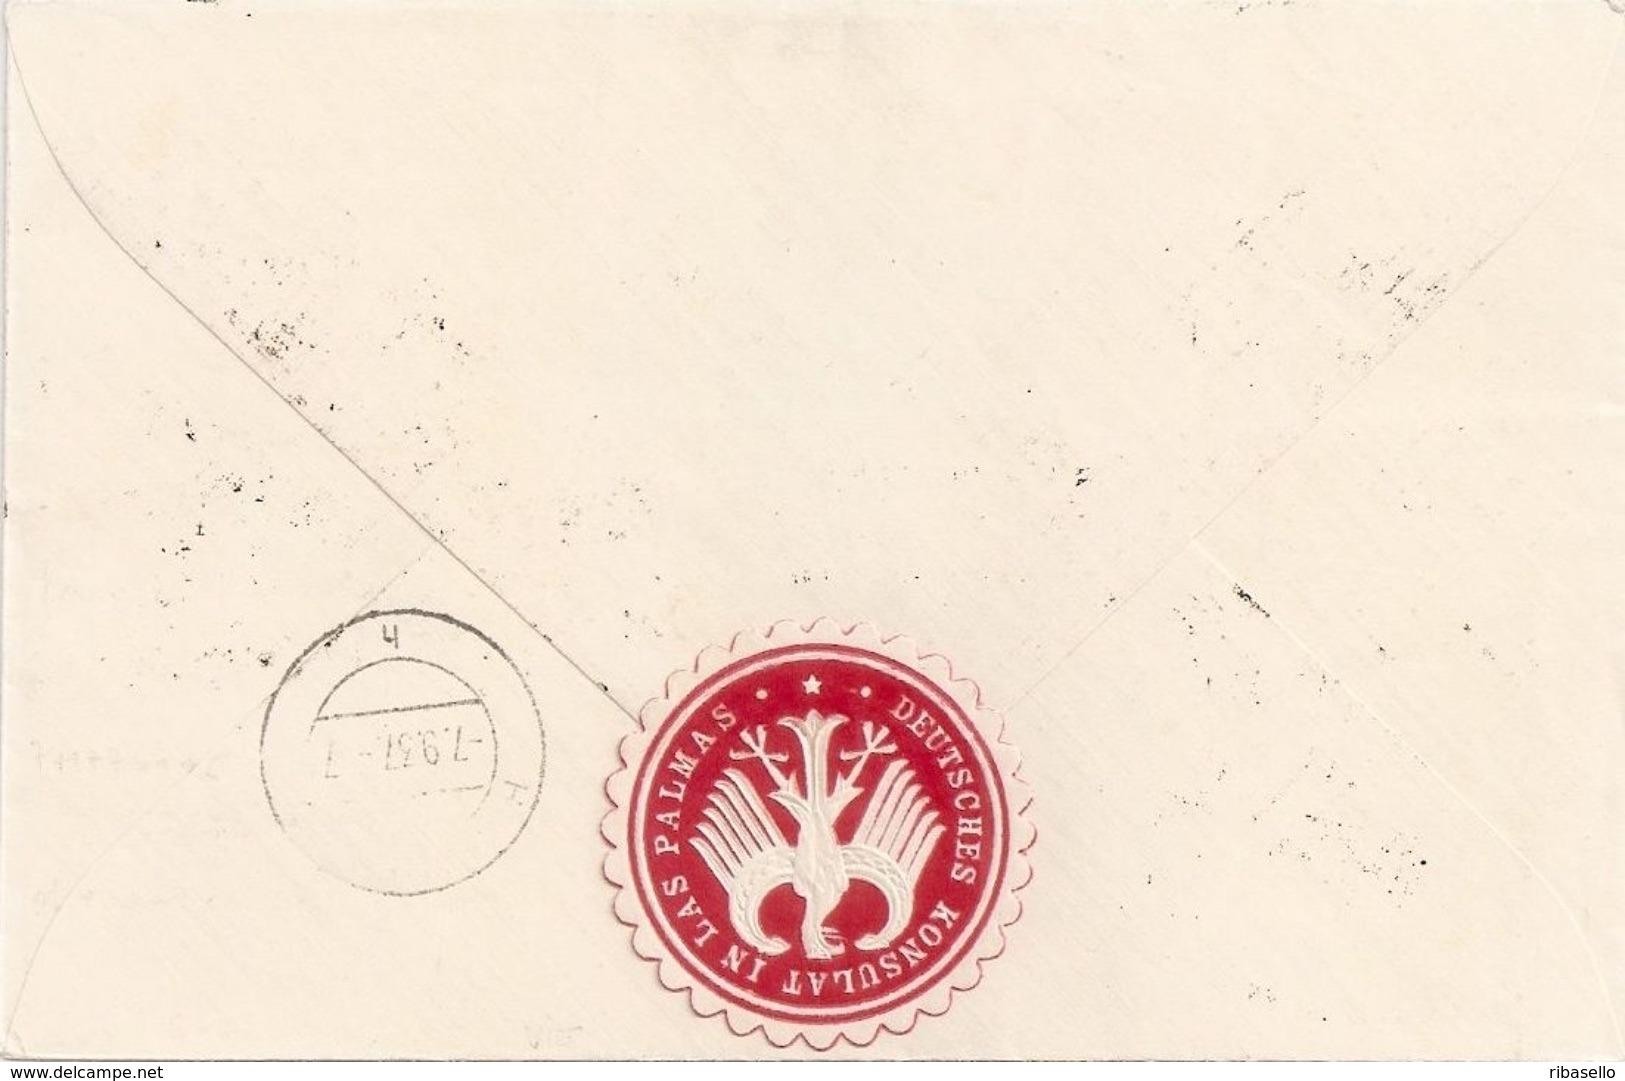 España 1937. Canarias. Carta De Las Palmas A Hamburgo. Censura. - Marcas De Censura Nacional